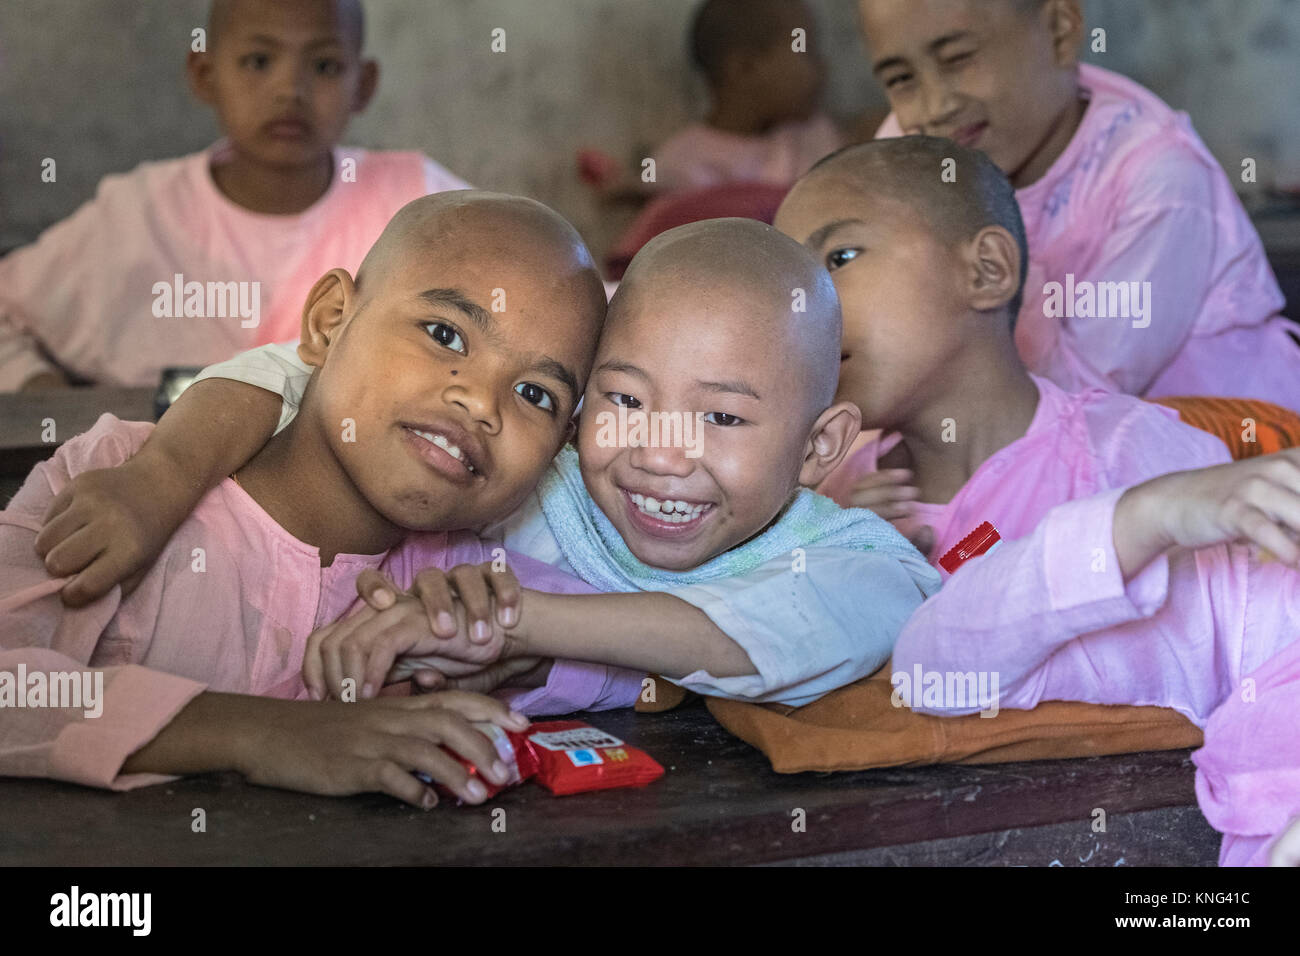 monk school, Sagaing, Mandalay, Myanmar, Asia - Stock Image